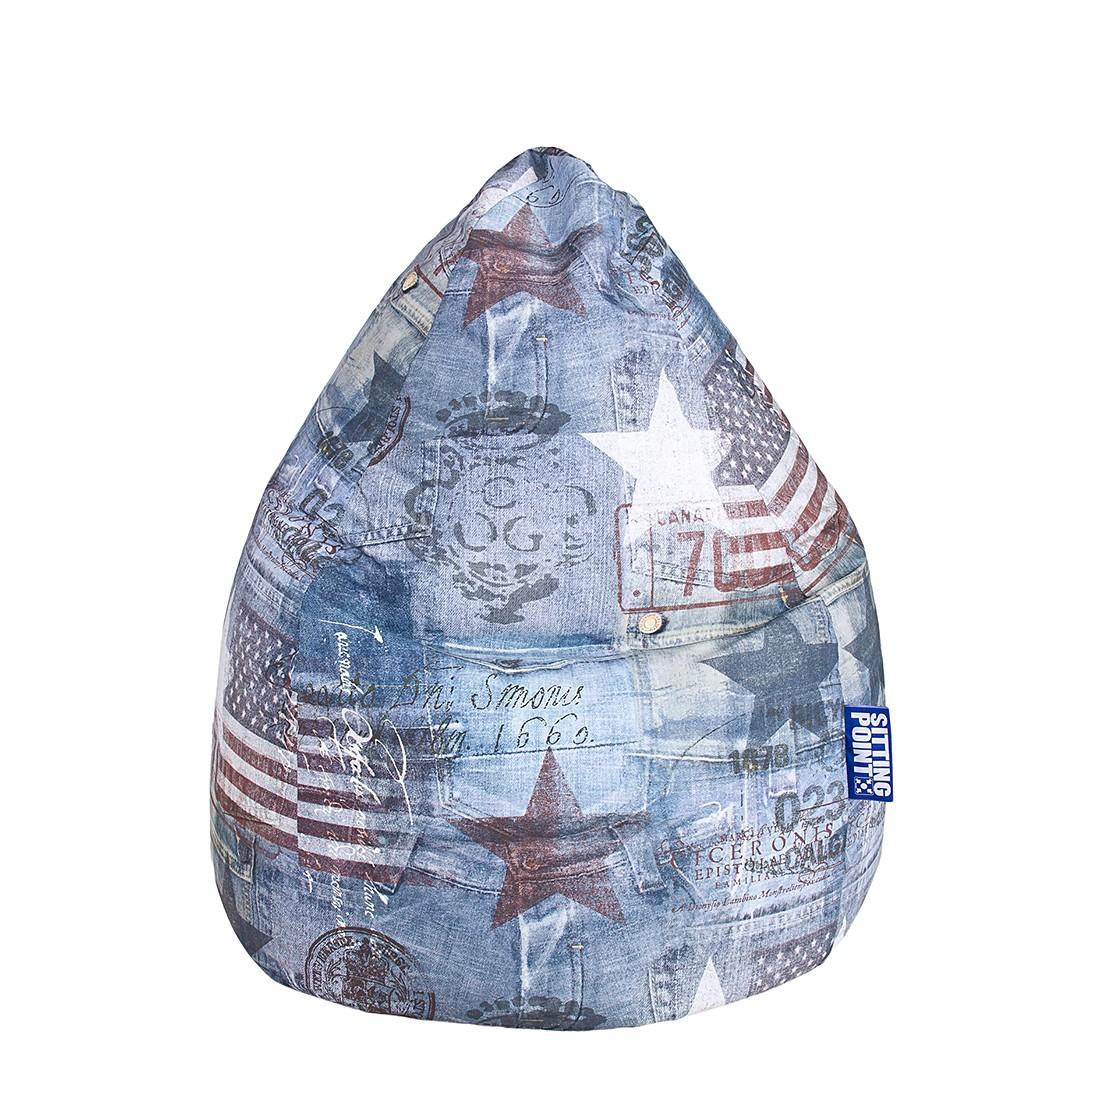 Sitzsack BeanBag Americano XL – Microfaser – Jeansblau, Fredriks günstig online kaufen